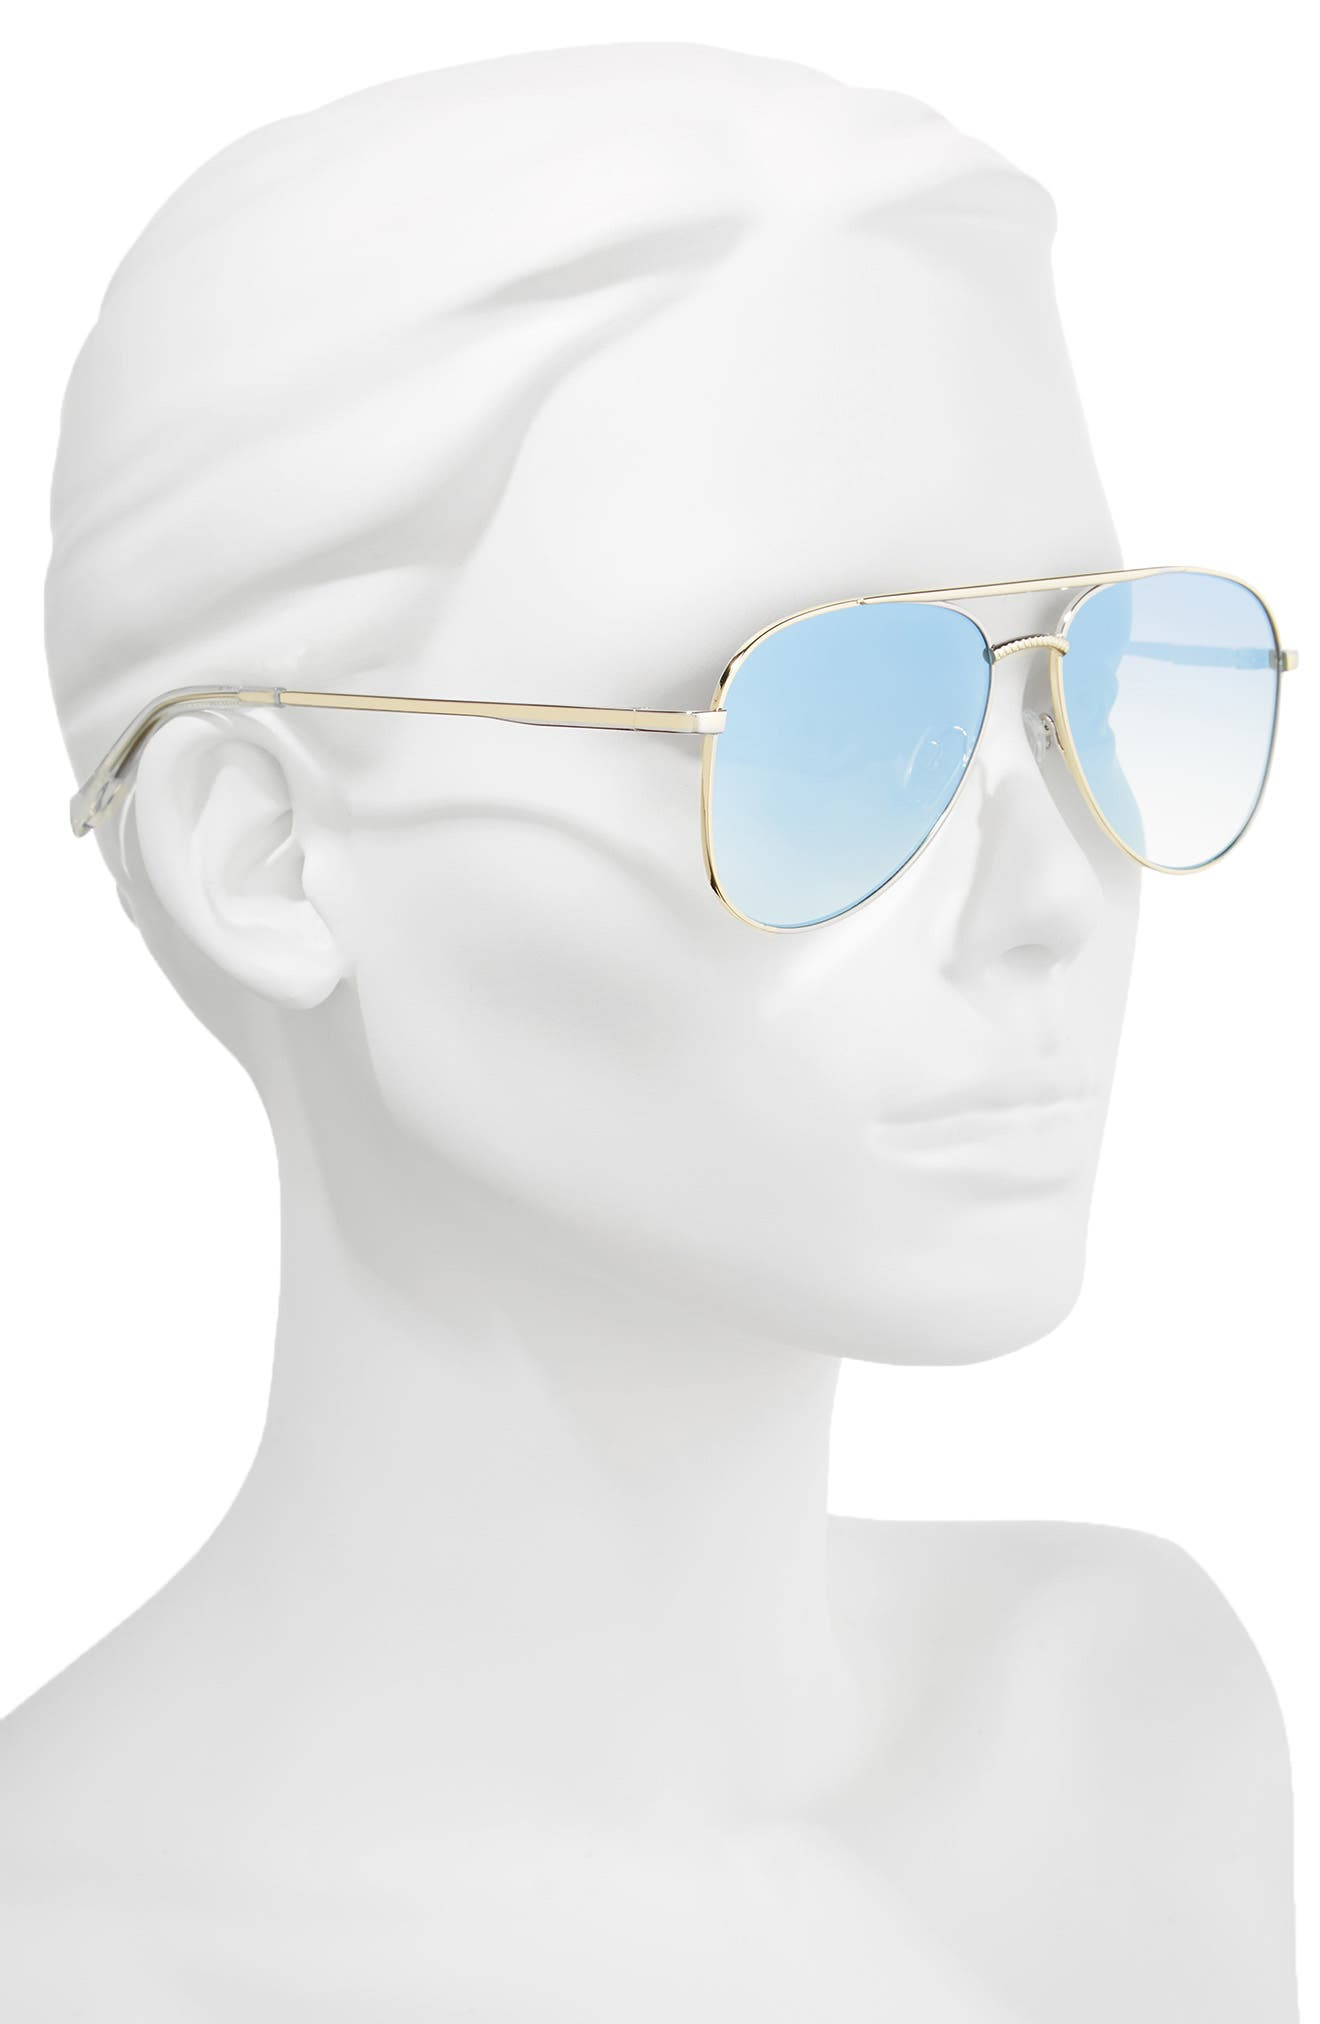 Kingdom 57mm Aviator Sunglasses,                             Alternate thumbnail 2, color,                             Bright Gold